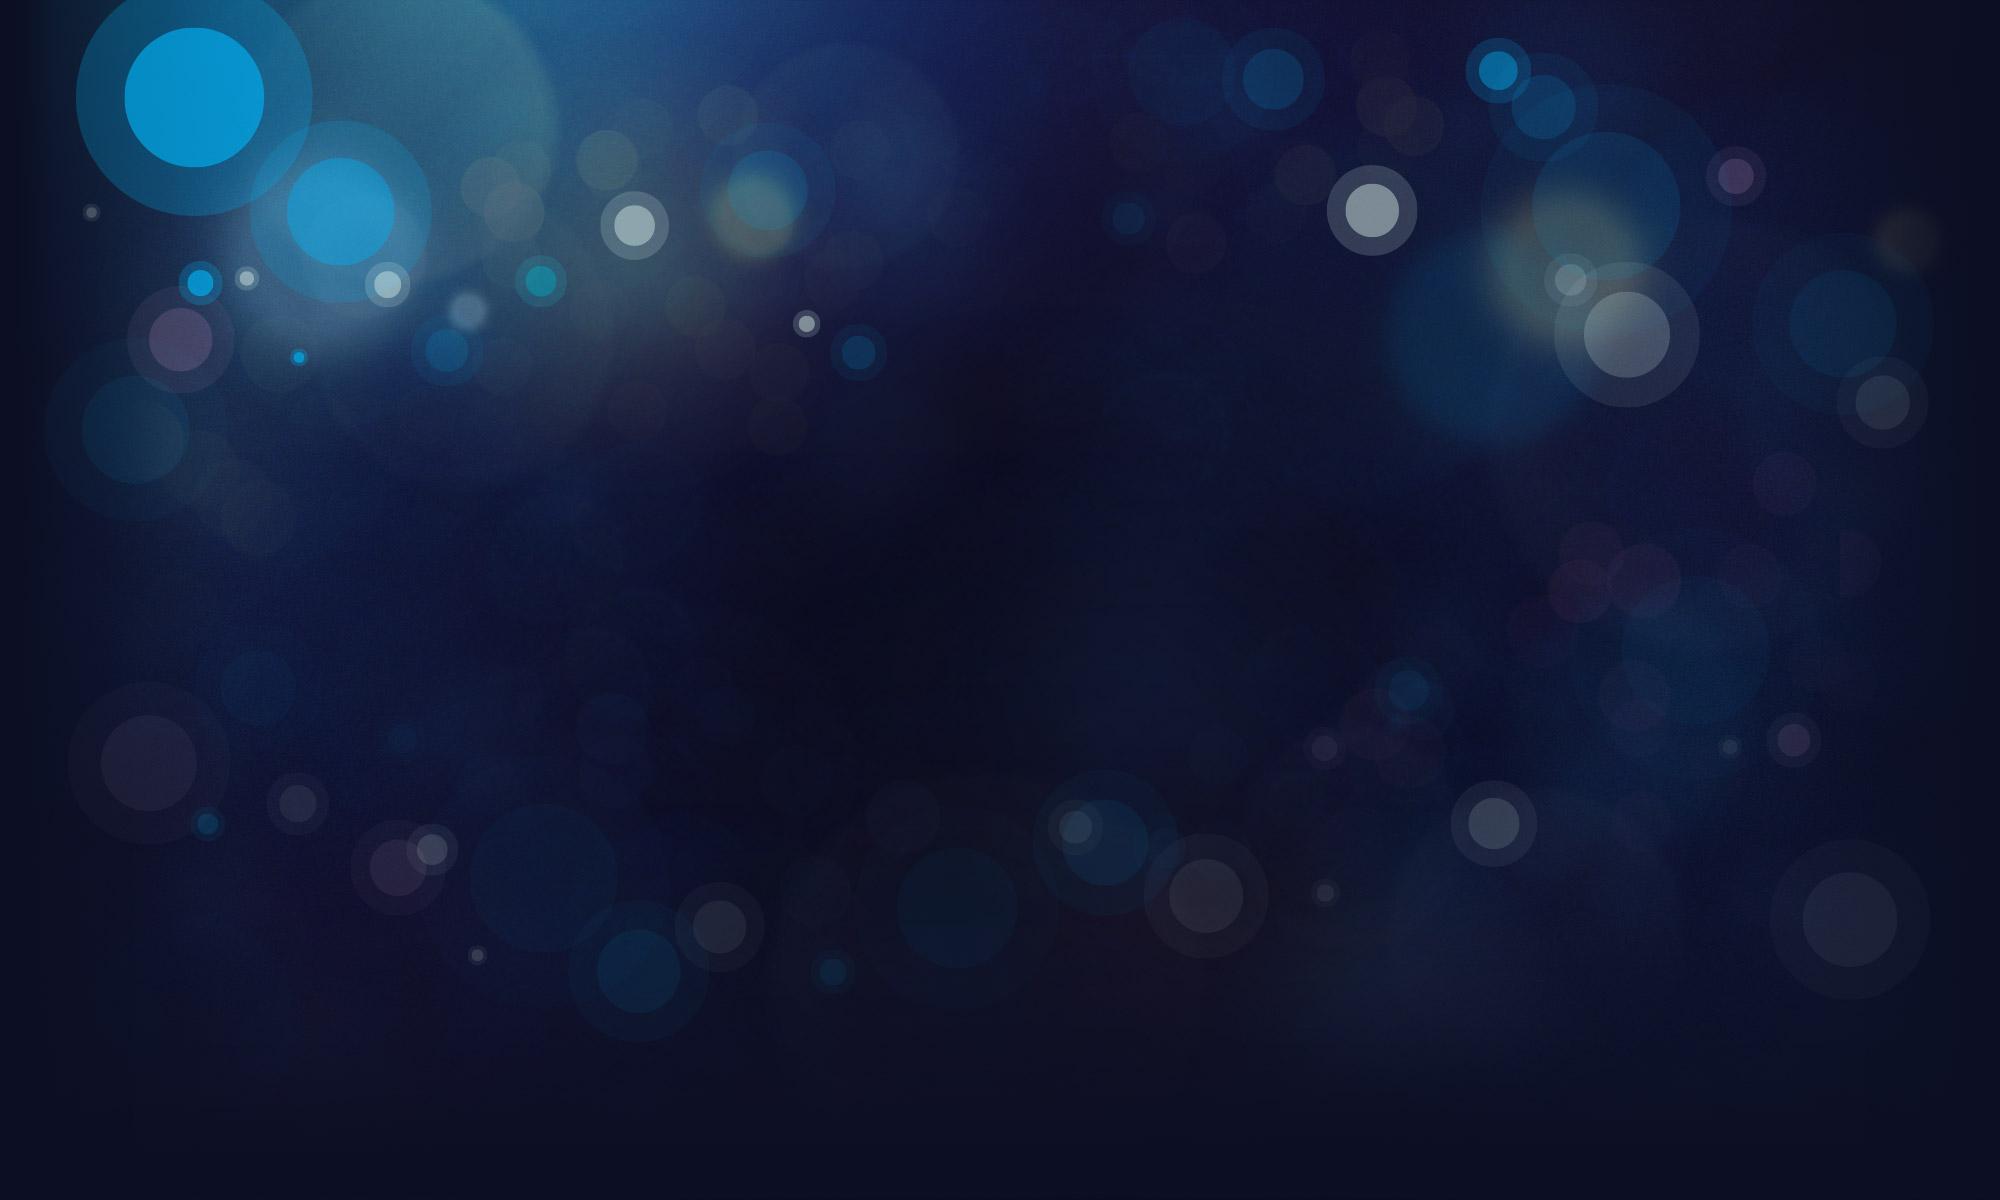 pandora-background